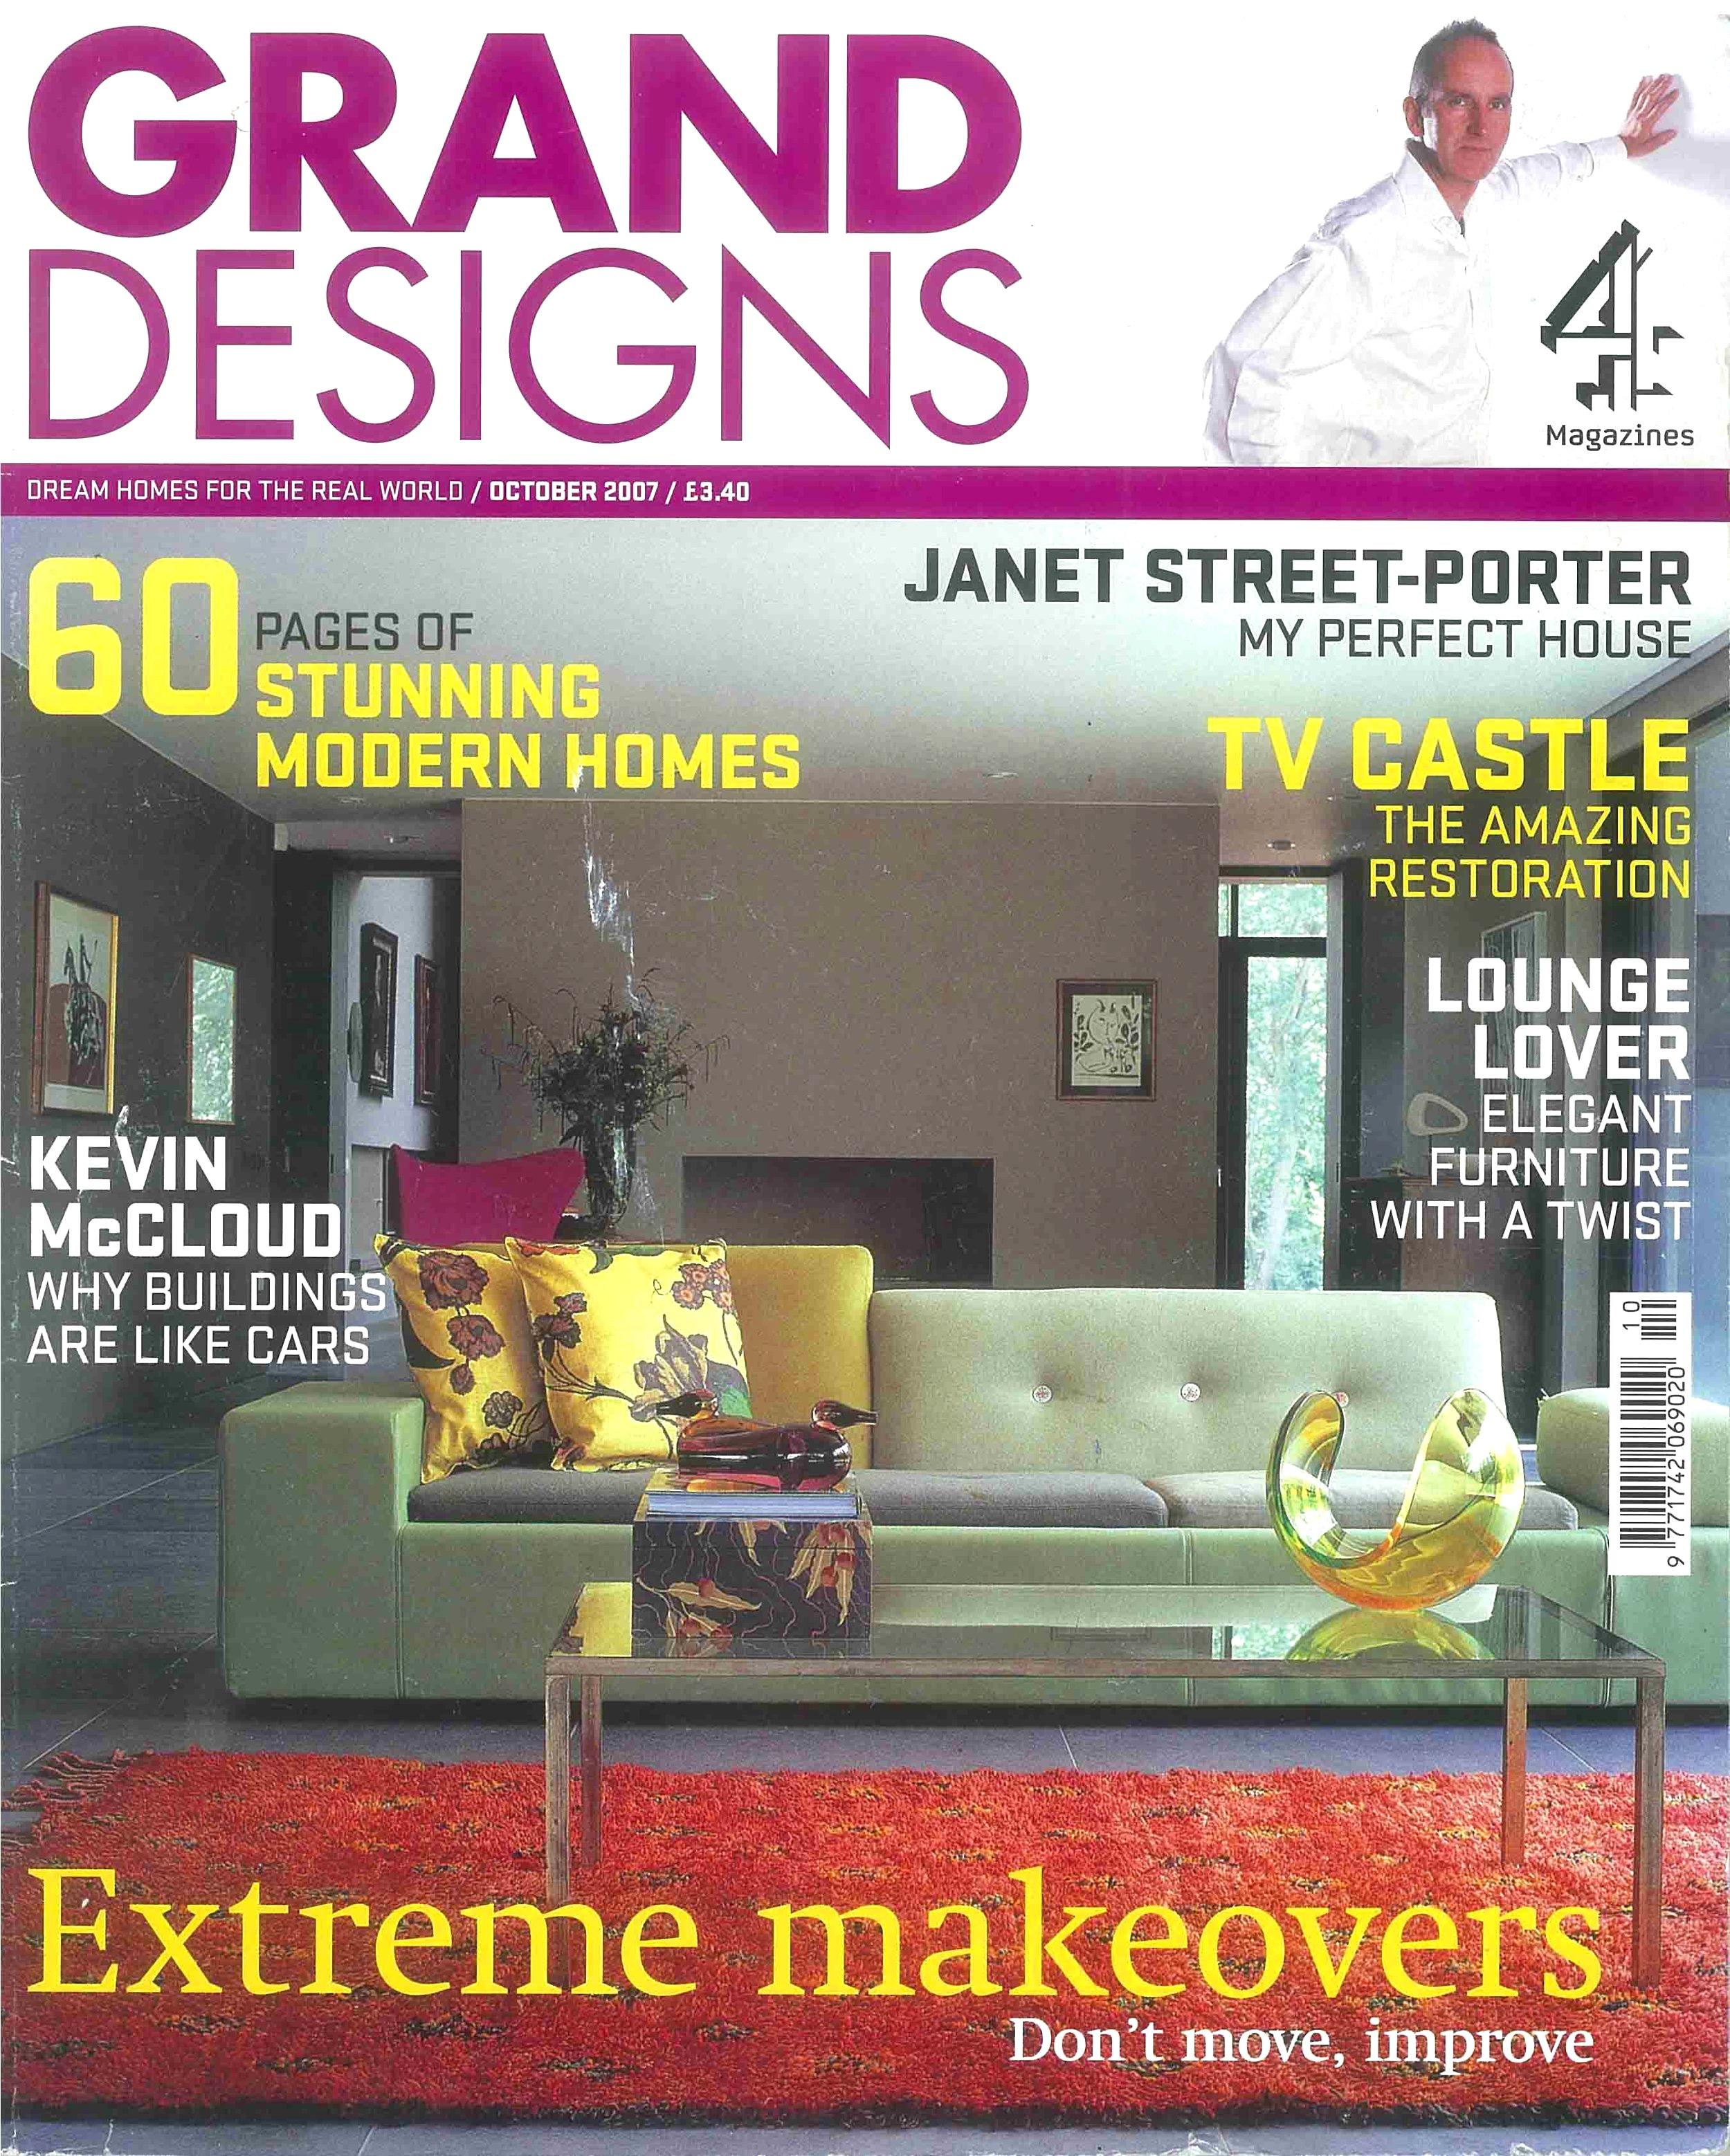 Grand Designs, October 2007 -